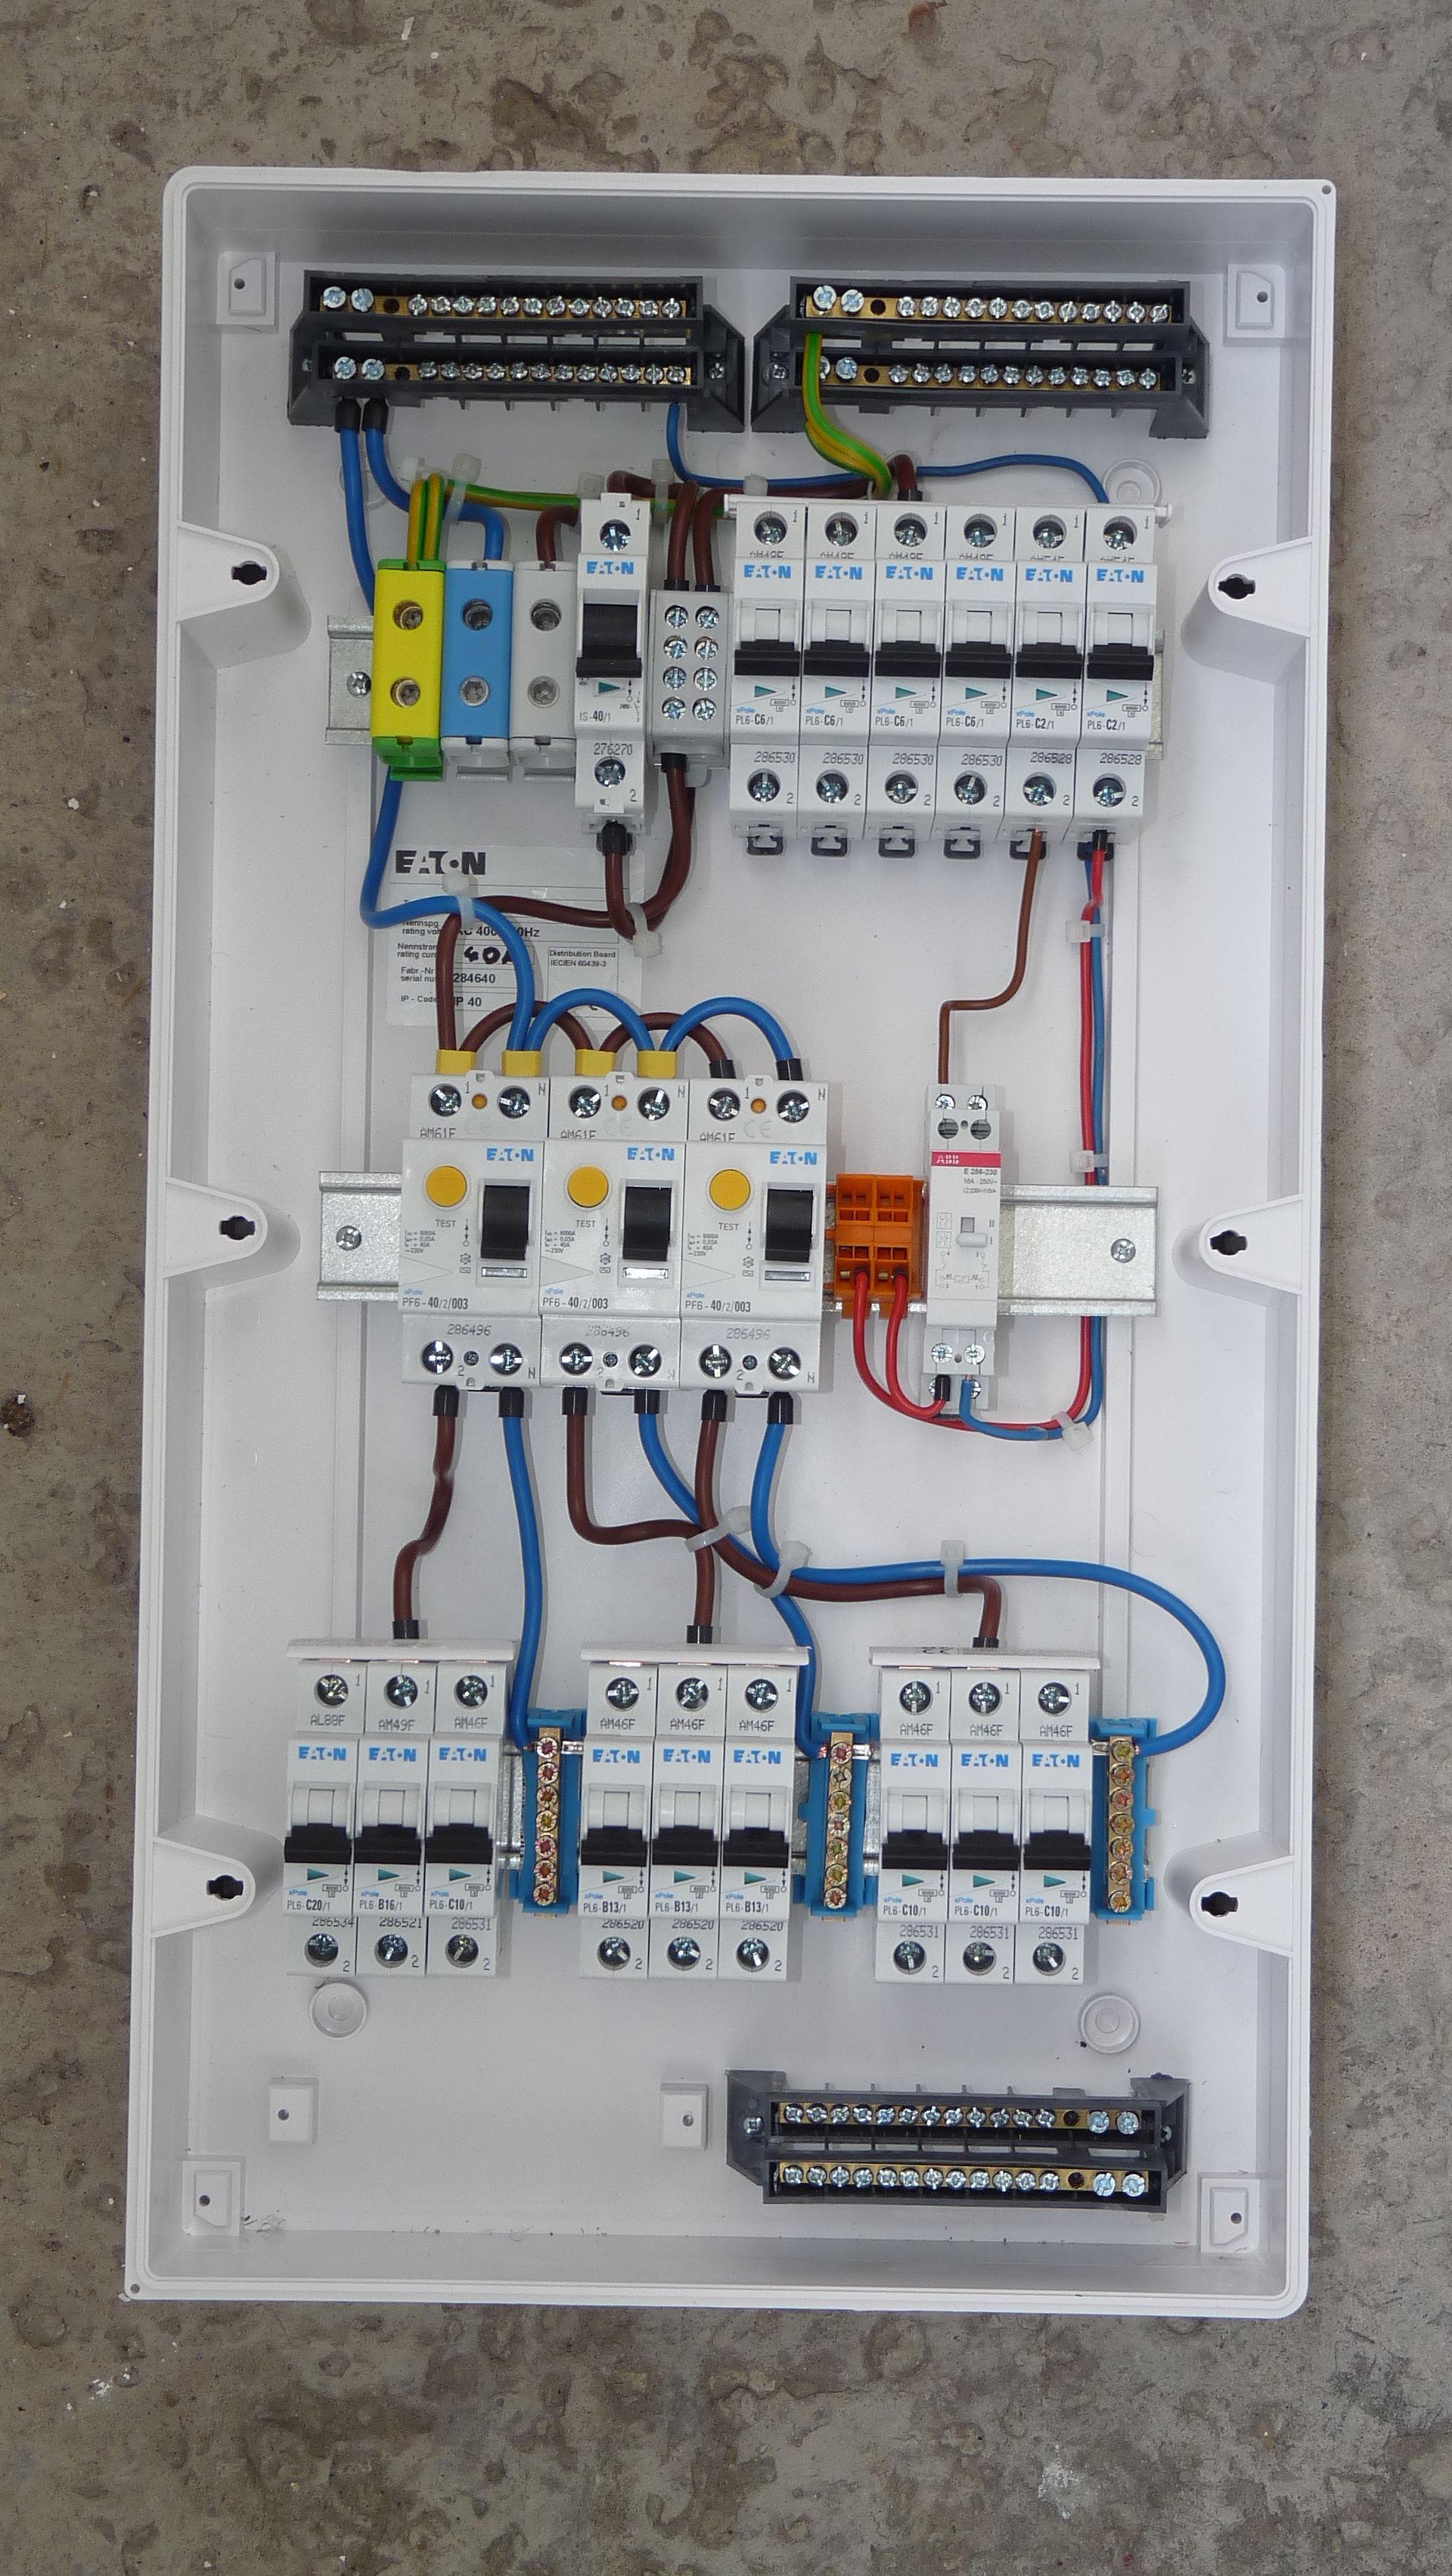 1920px Paekaare_24_ _fuse_box?resize\\\\\\\=665%2C1180\\\\\\\&ssl\\\\\\\=1 residential wiring diagram fuse box residential fuse box wiring 60 Amp Fuse Box Wiring at eliteediting.co